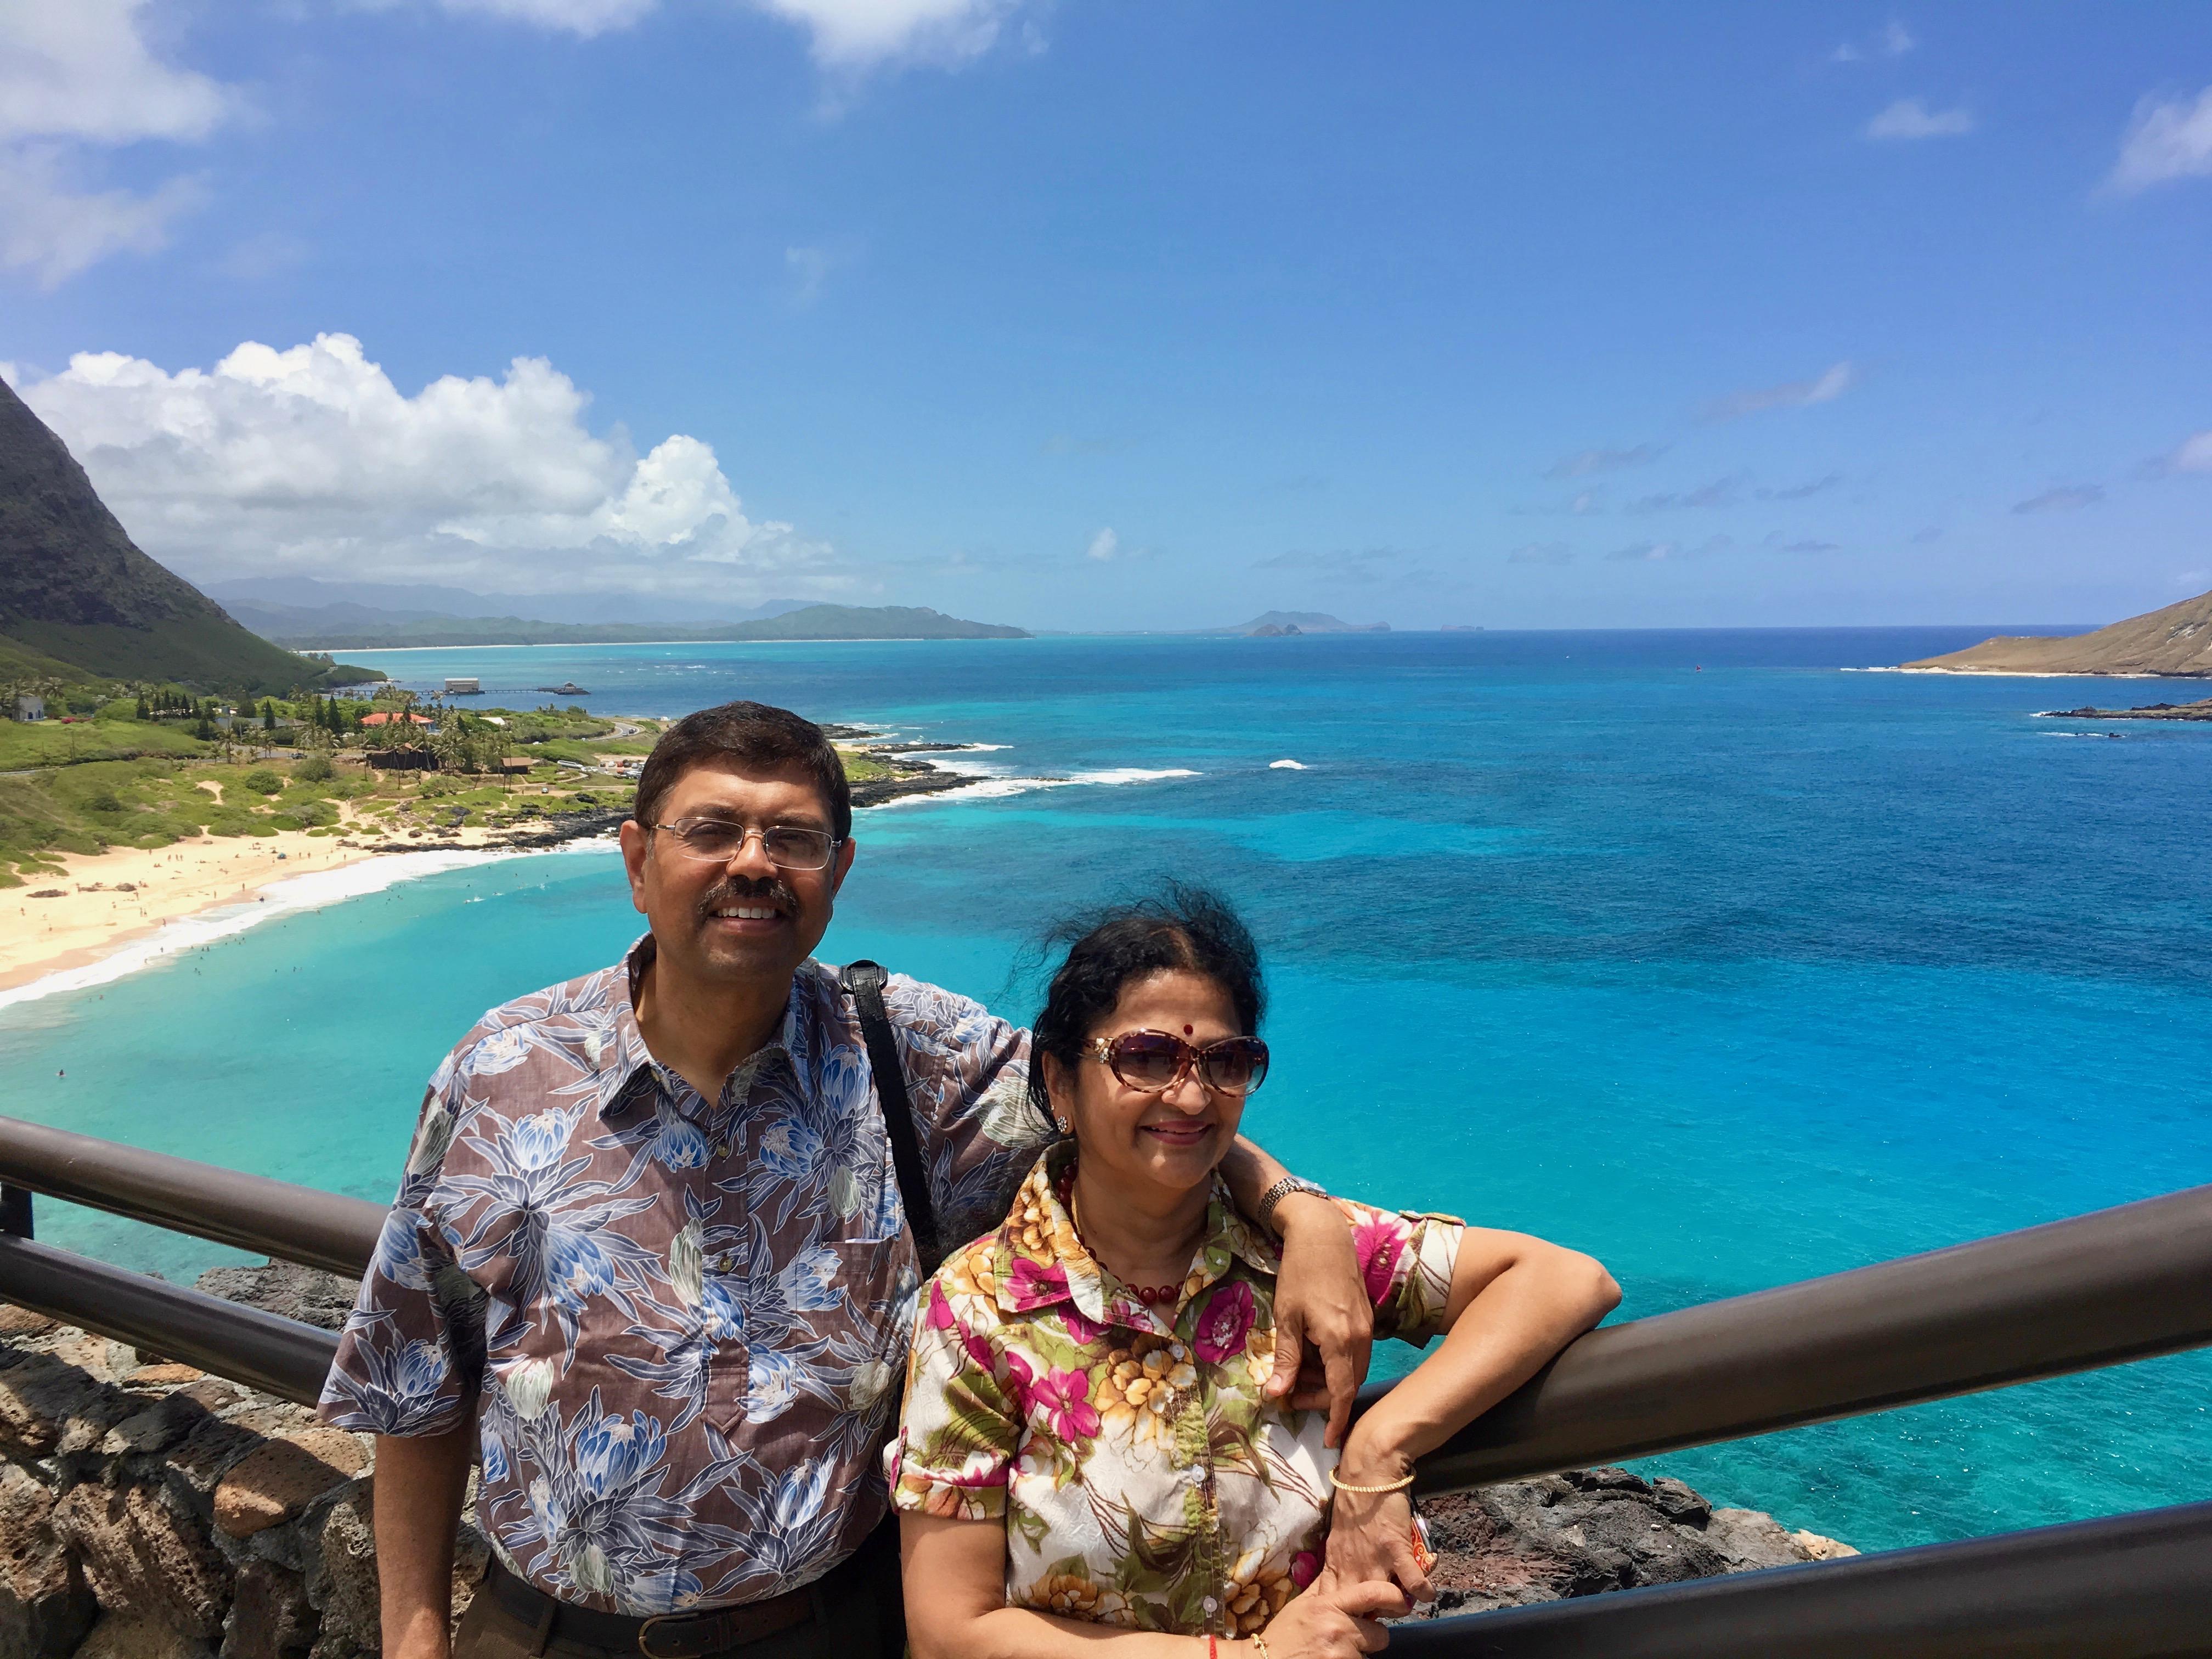 top scenic spots in Oahu, scenic drives in Oahu, must-see spots in Oahu, Oahu things to do